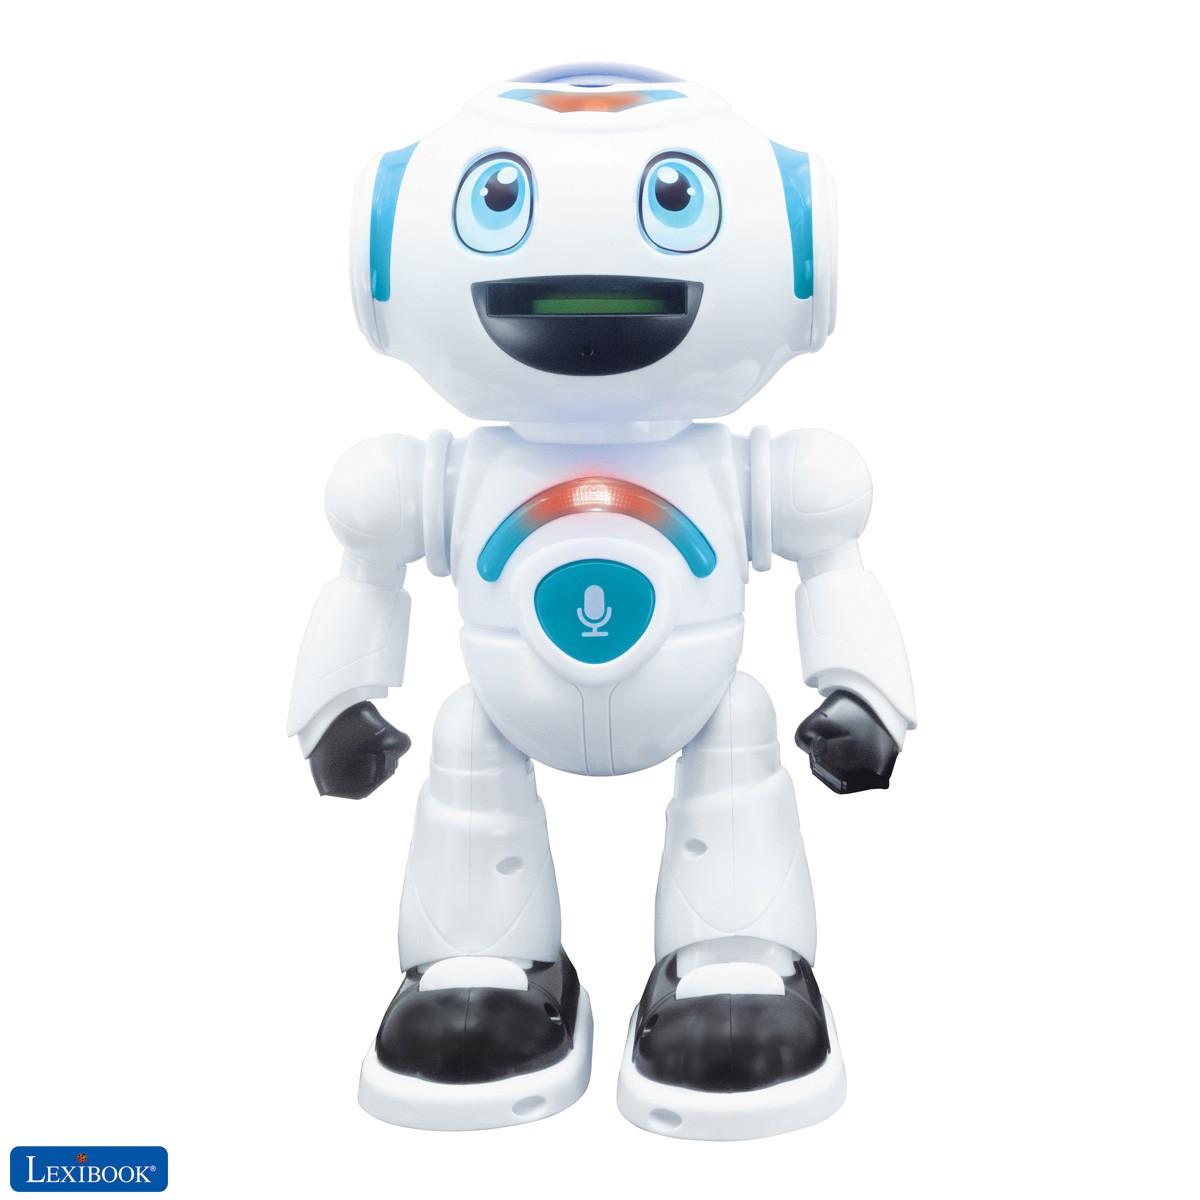 Powerman Master Robot de Juguete Interactivo